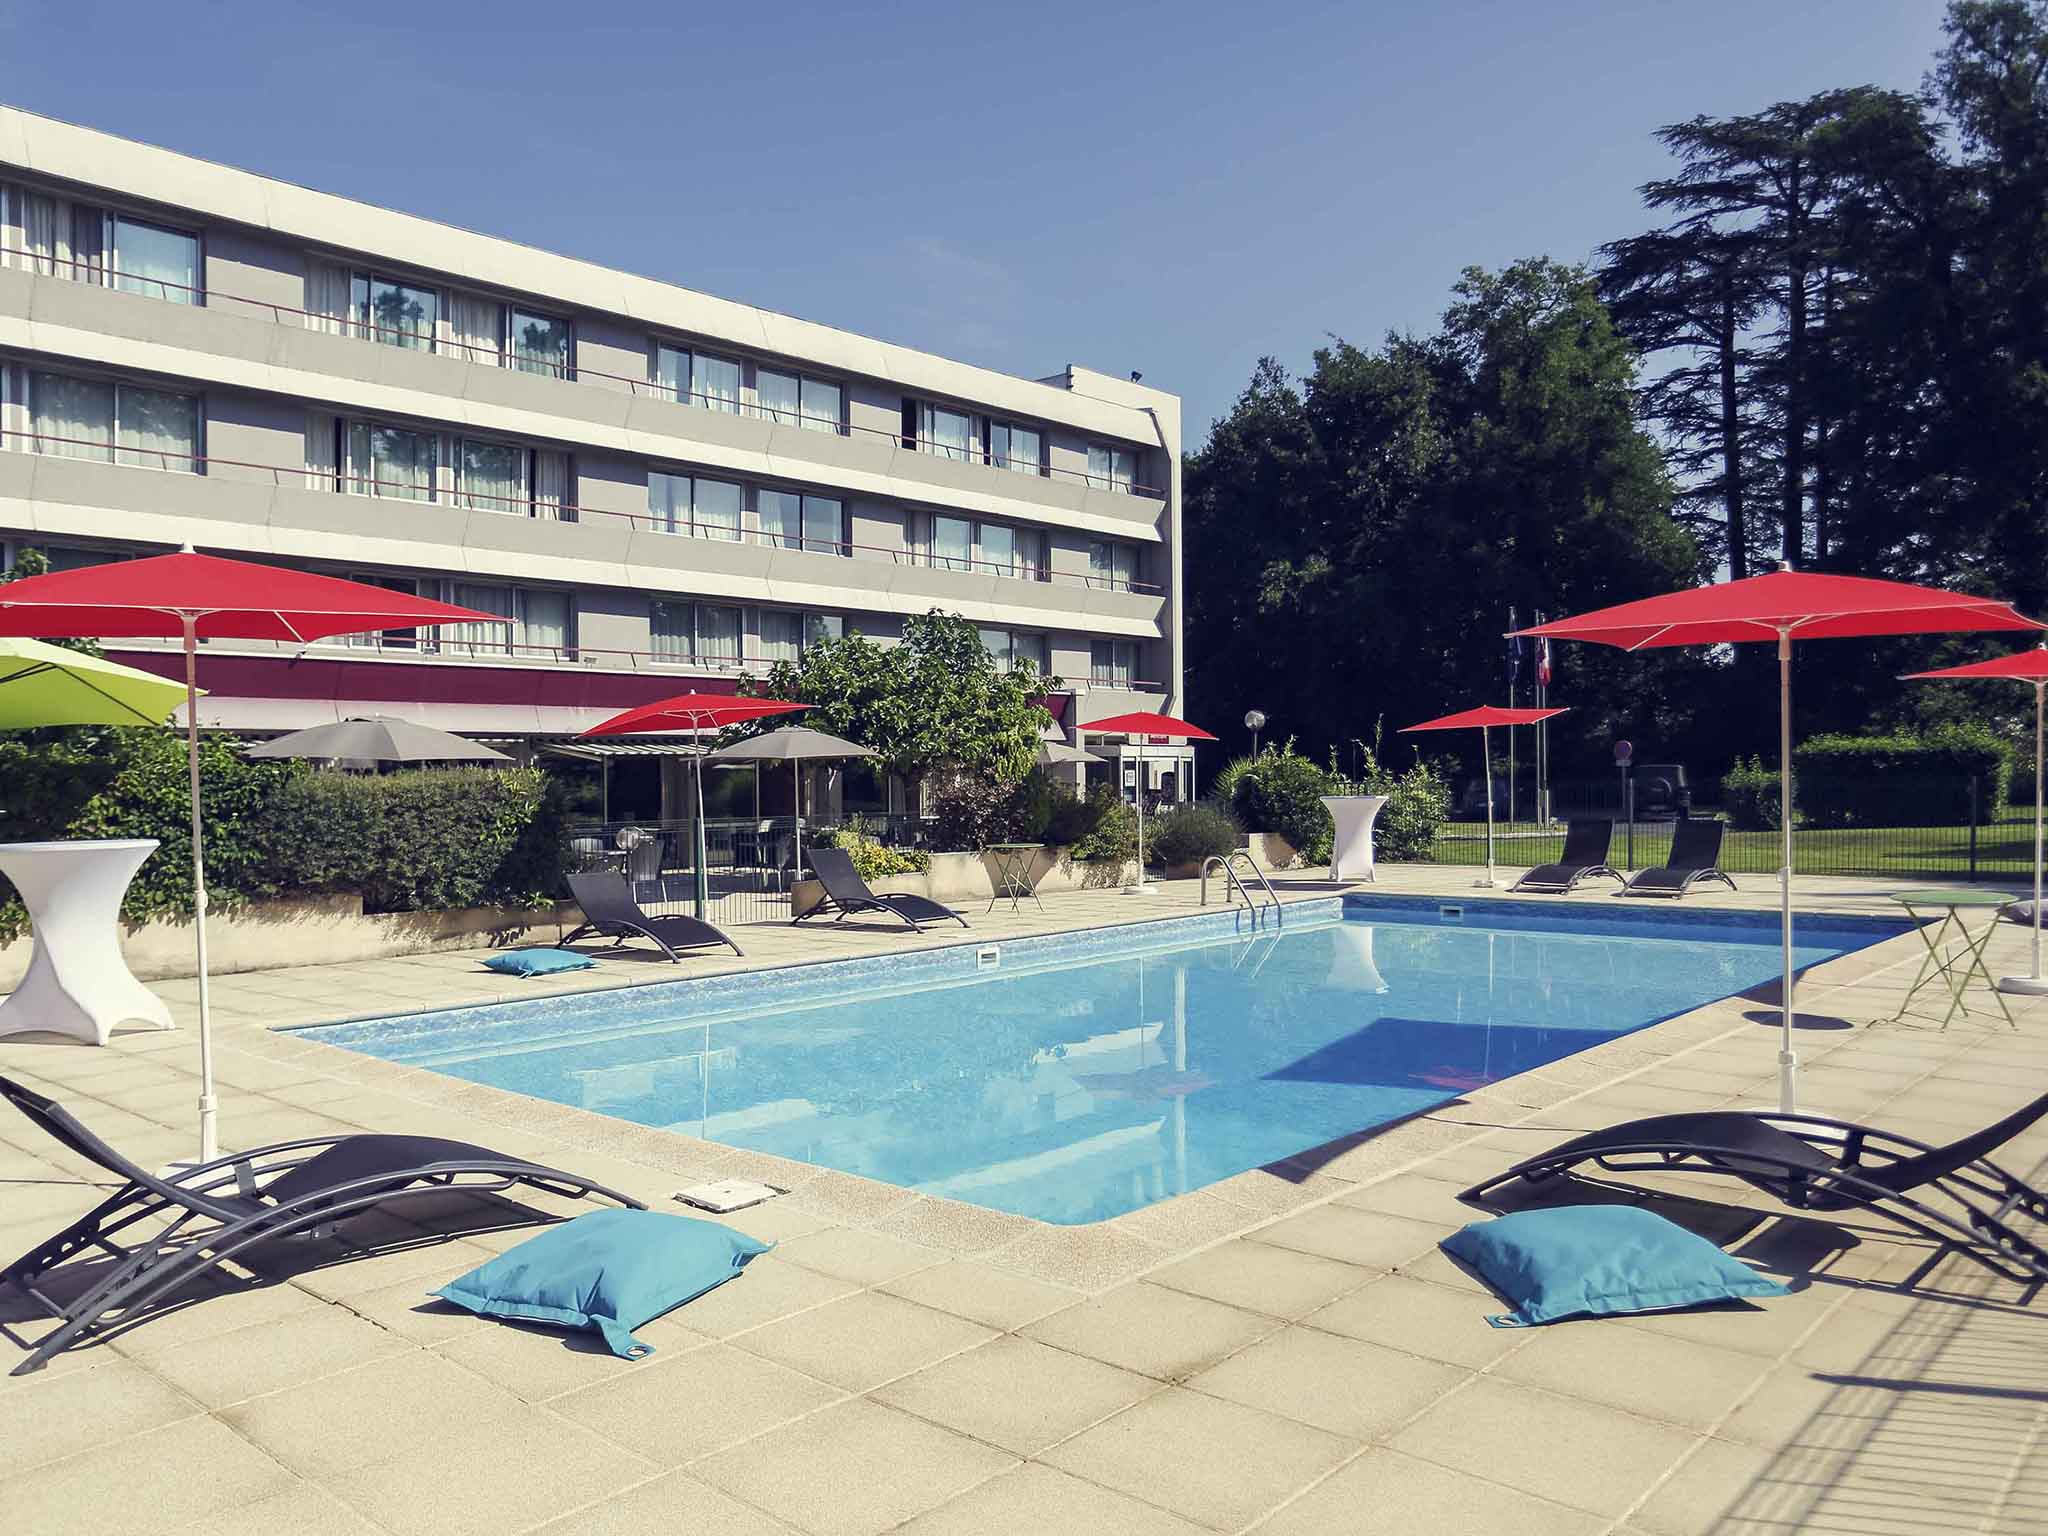 Отель — Hôtel Mercure Brive